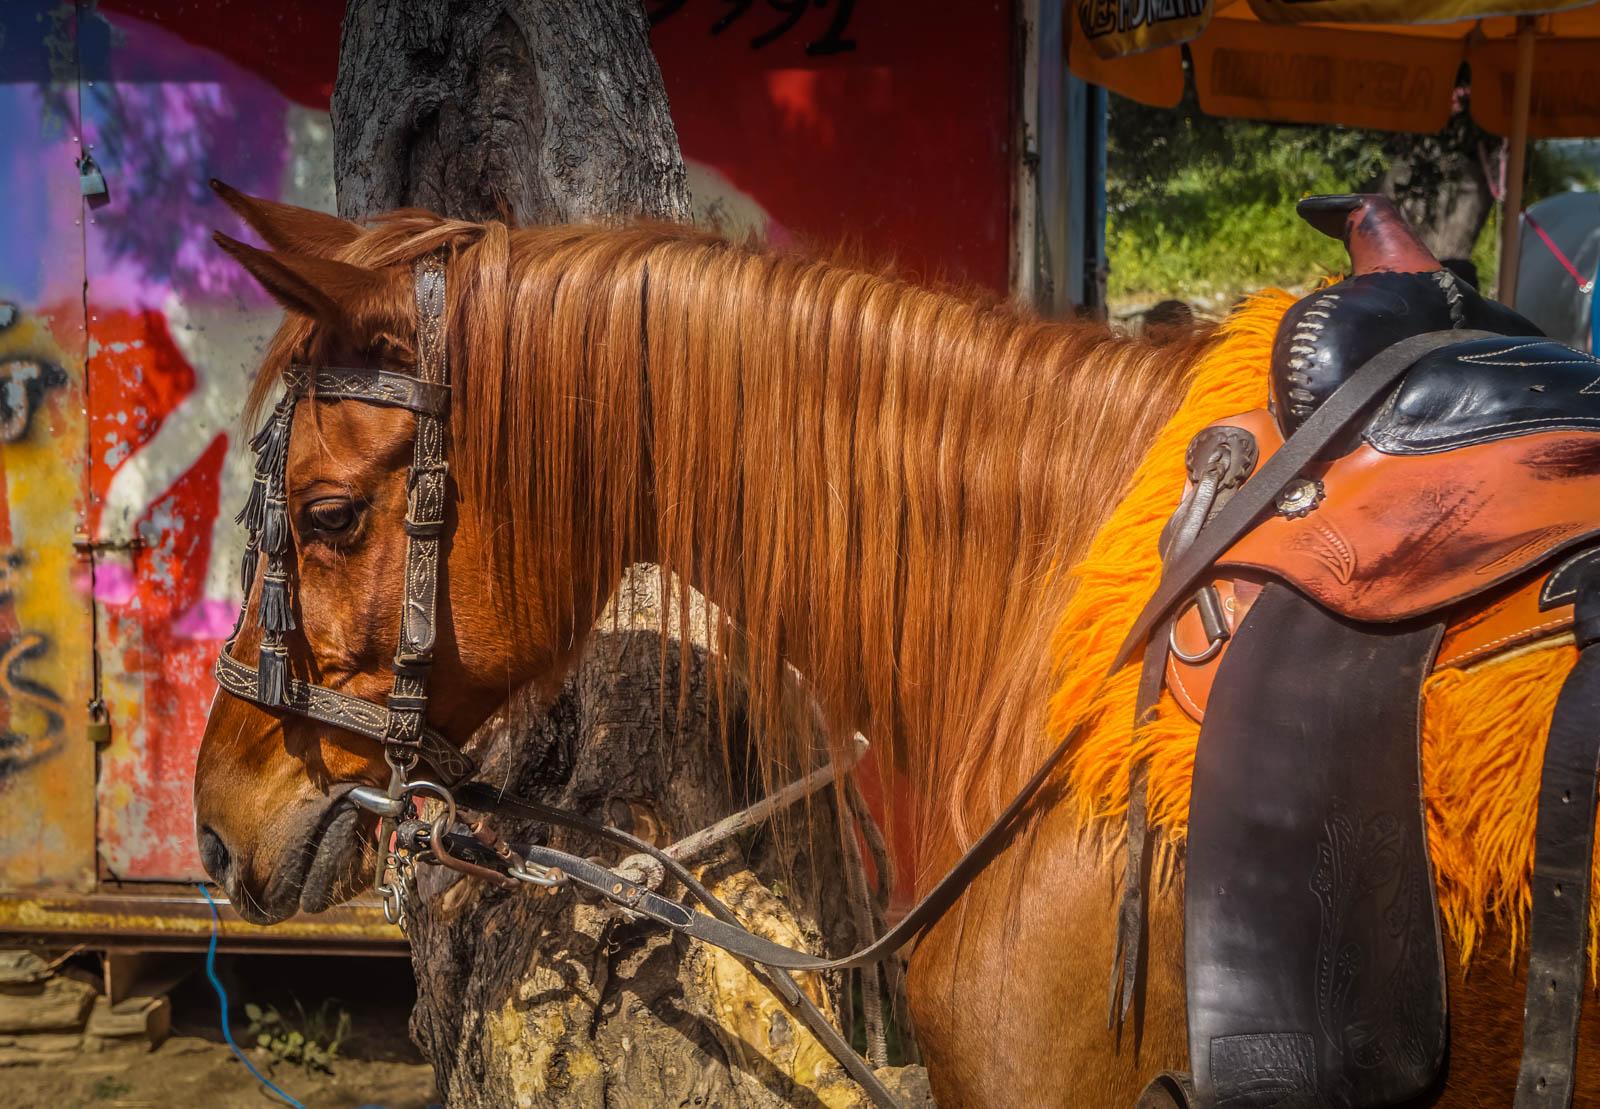 horseback-riding-pelion-greece-la-vie-en-blog-all-rights-reserved-7